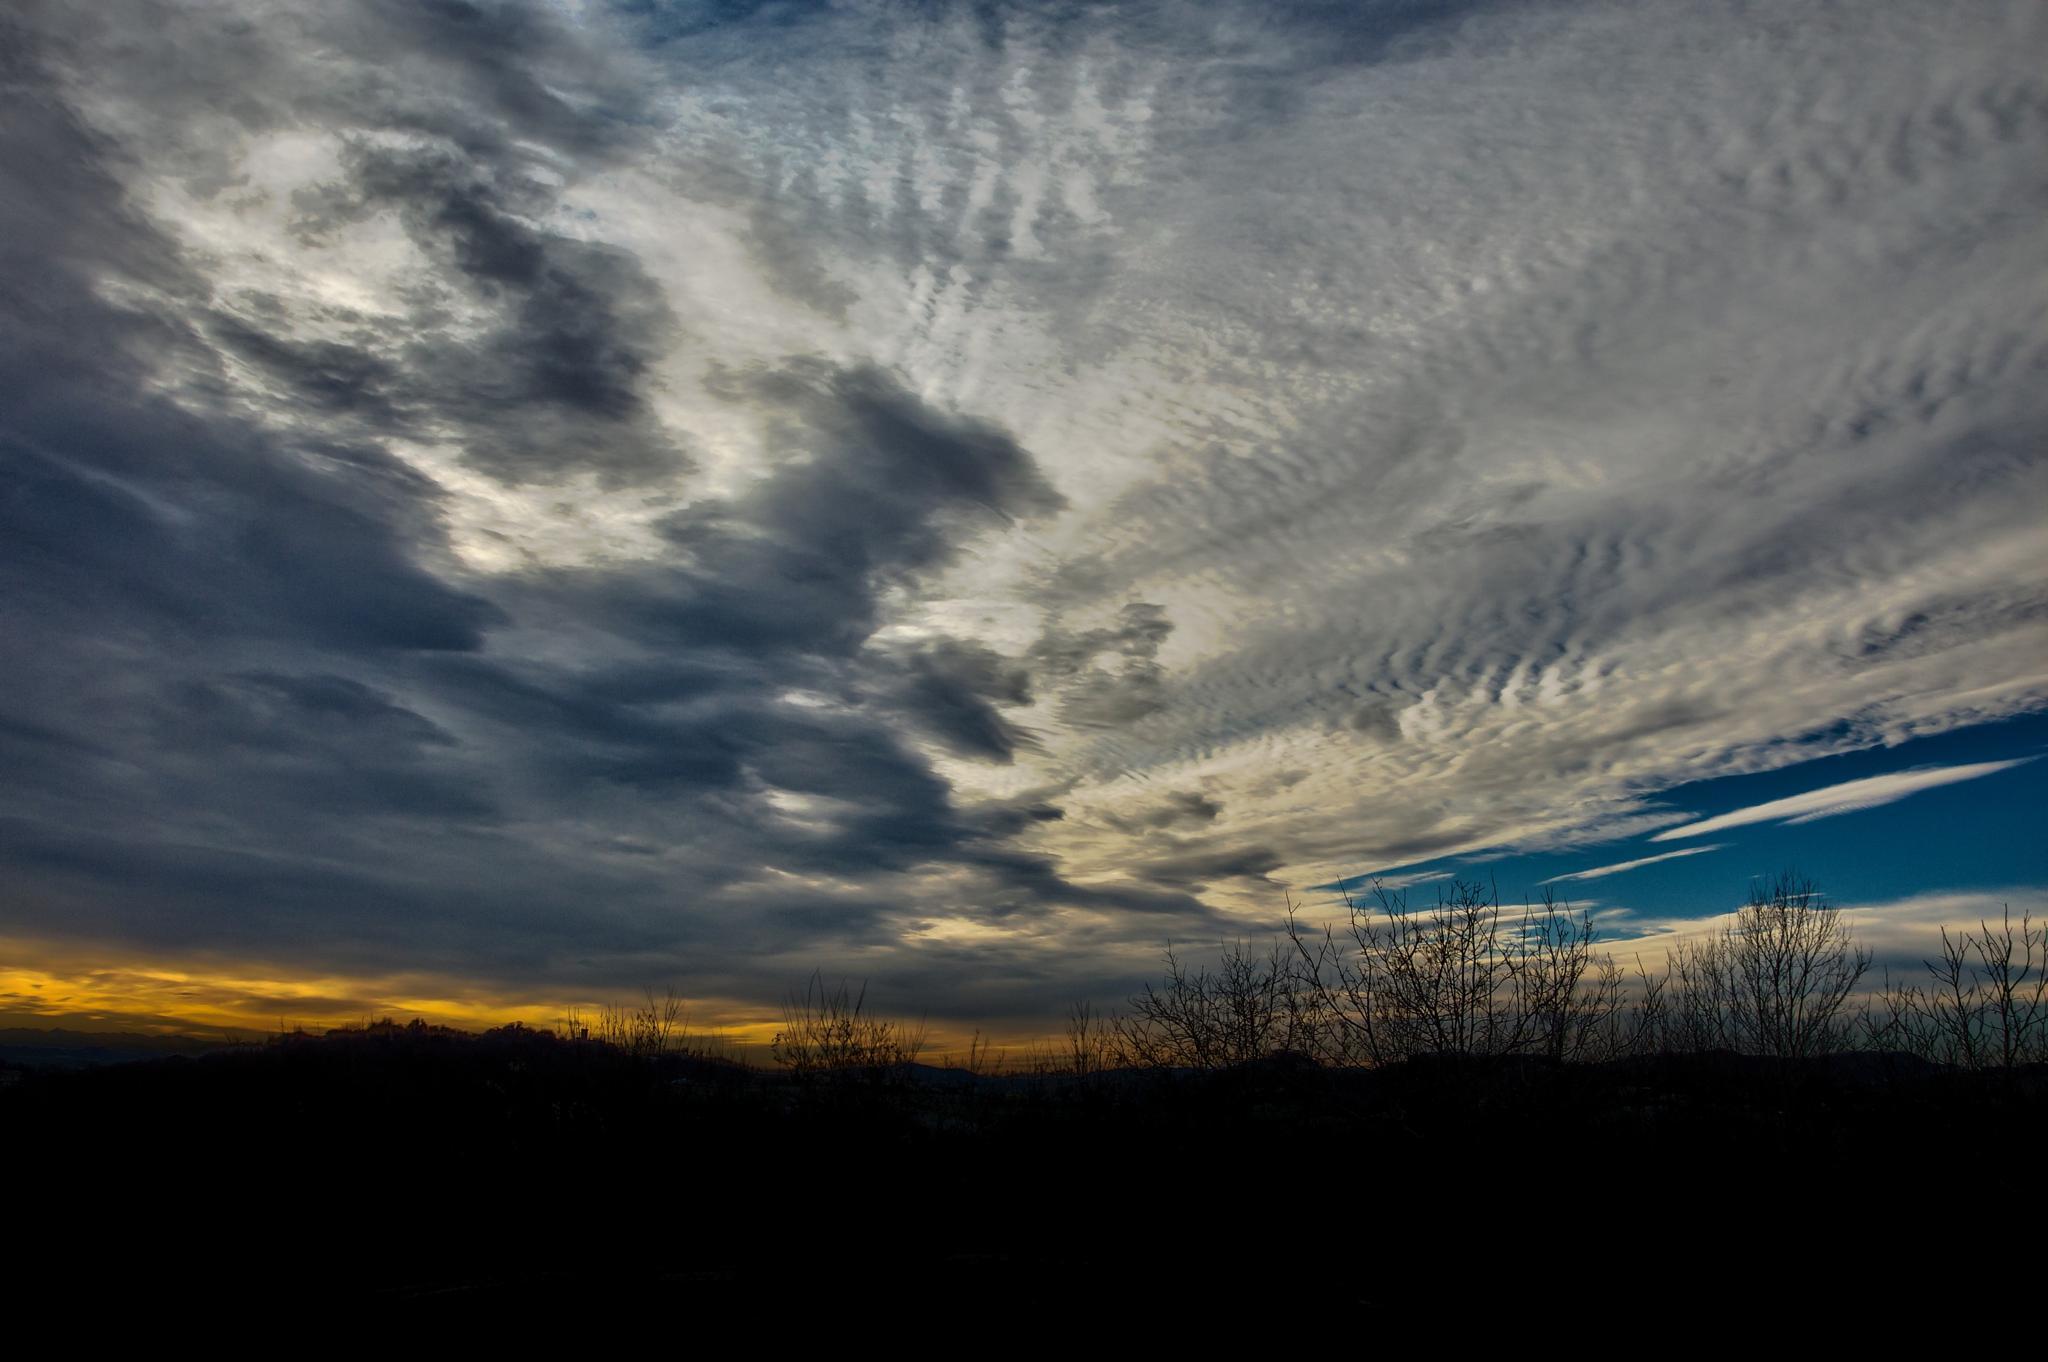 Sunset by gennaro.riccio